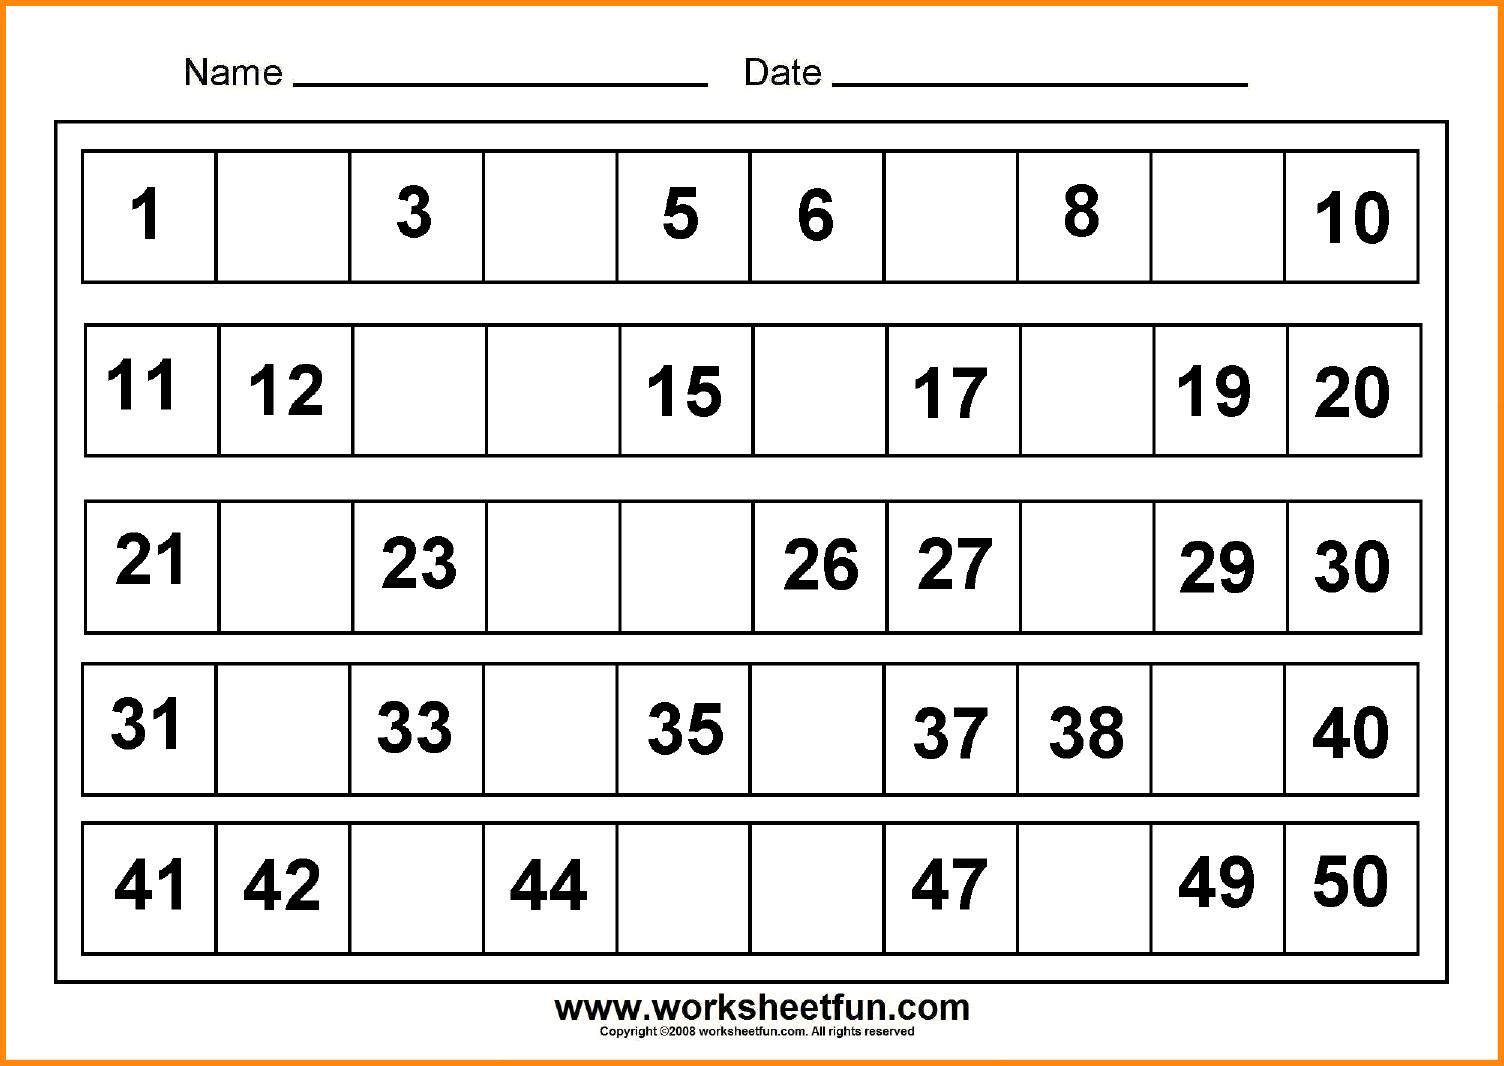 10 Missing Numbers Worksheets Media Resumed Kindergarten Number 1